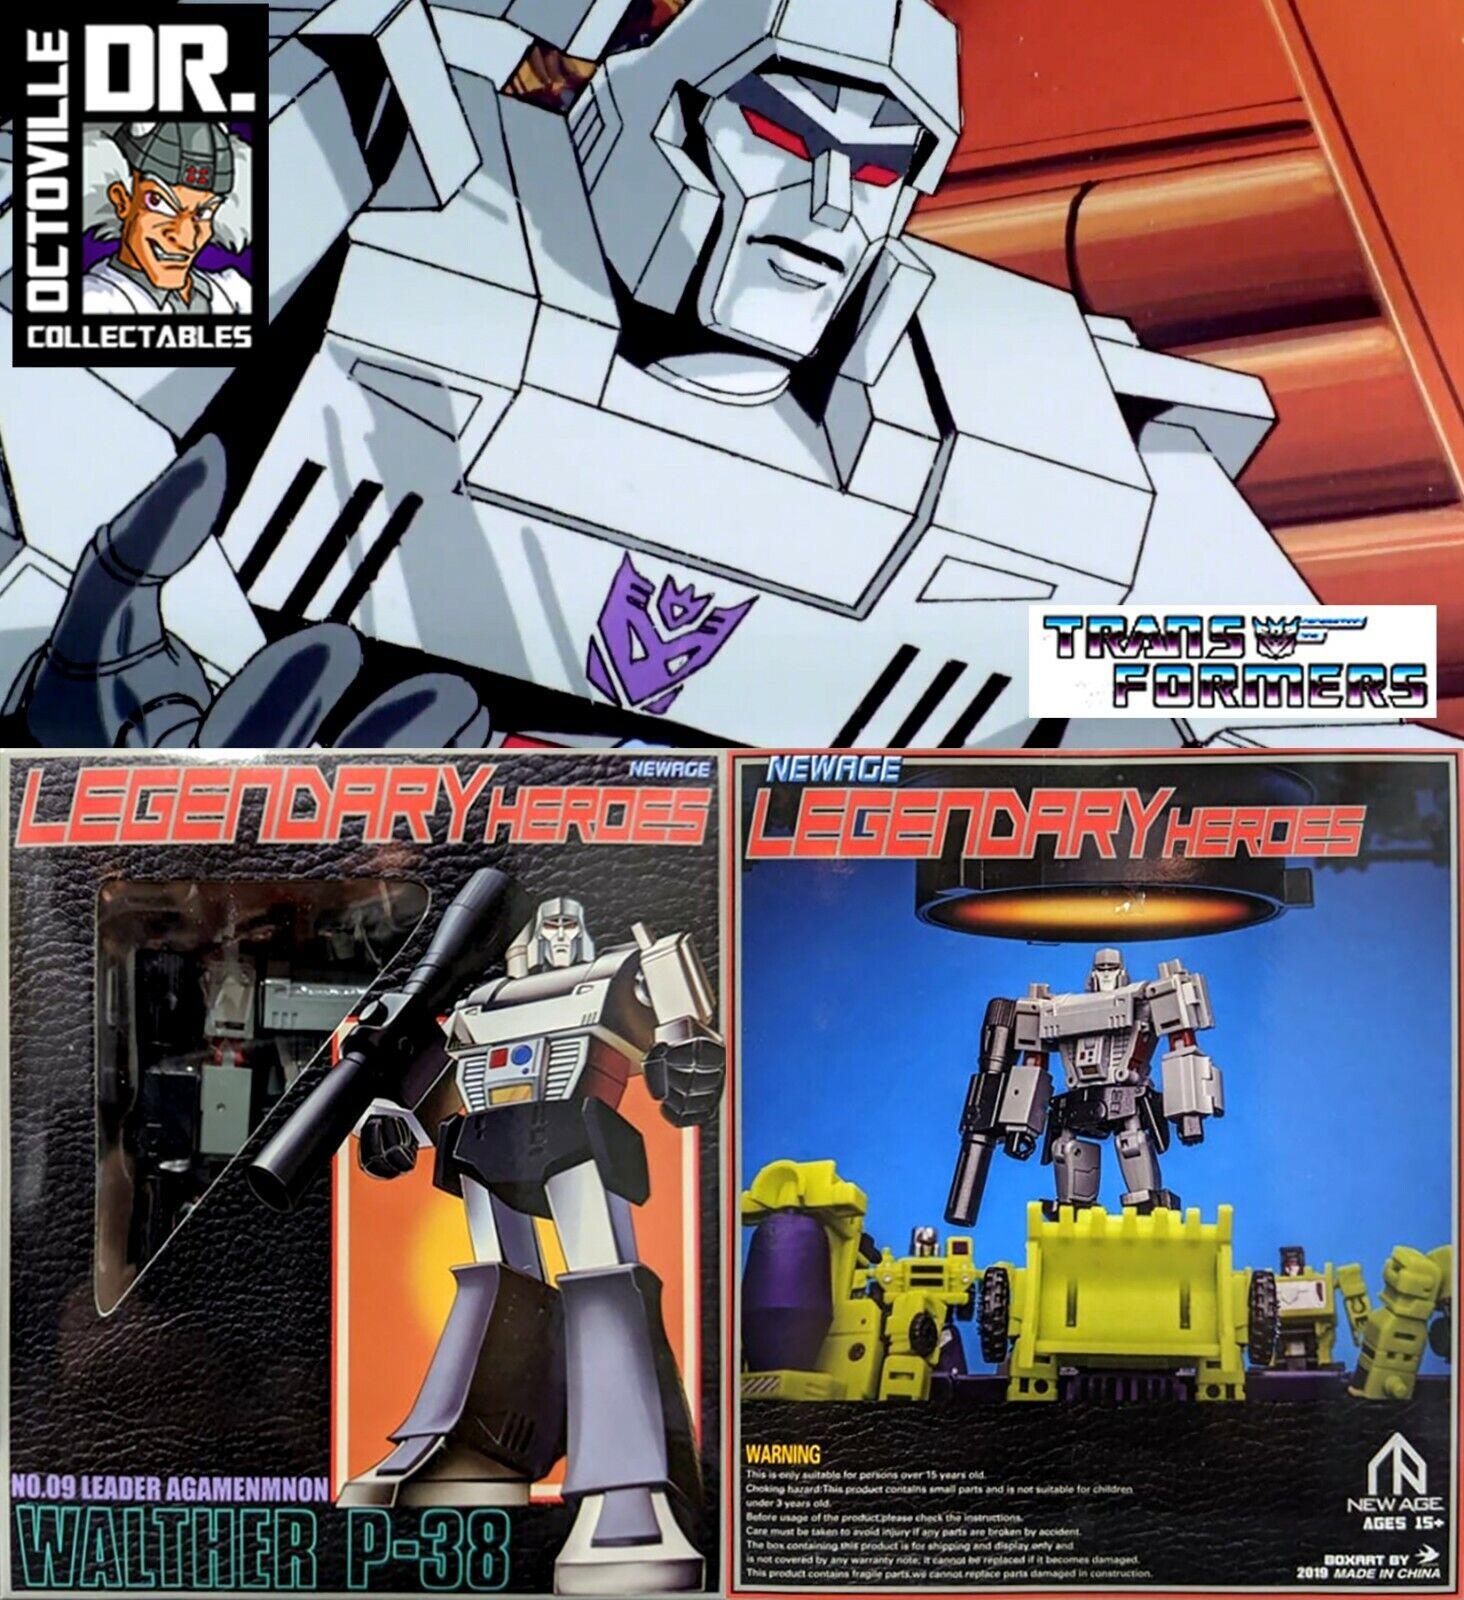 Transformers Newage H9 AgaSiemnon   Legends Scaled Megatron MISB